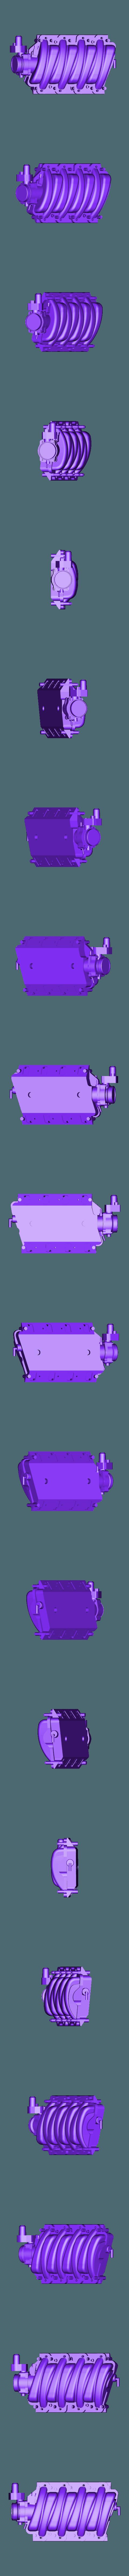 Intake_A.STL Download STL file Fury road hotrod bodyshell 1/10 • 3D printing design, RCGANG93